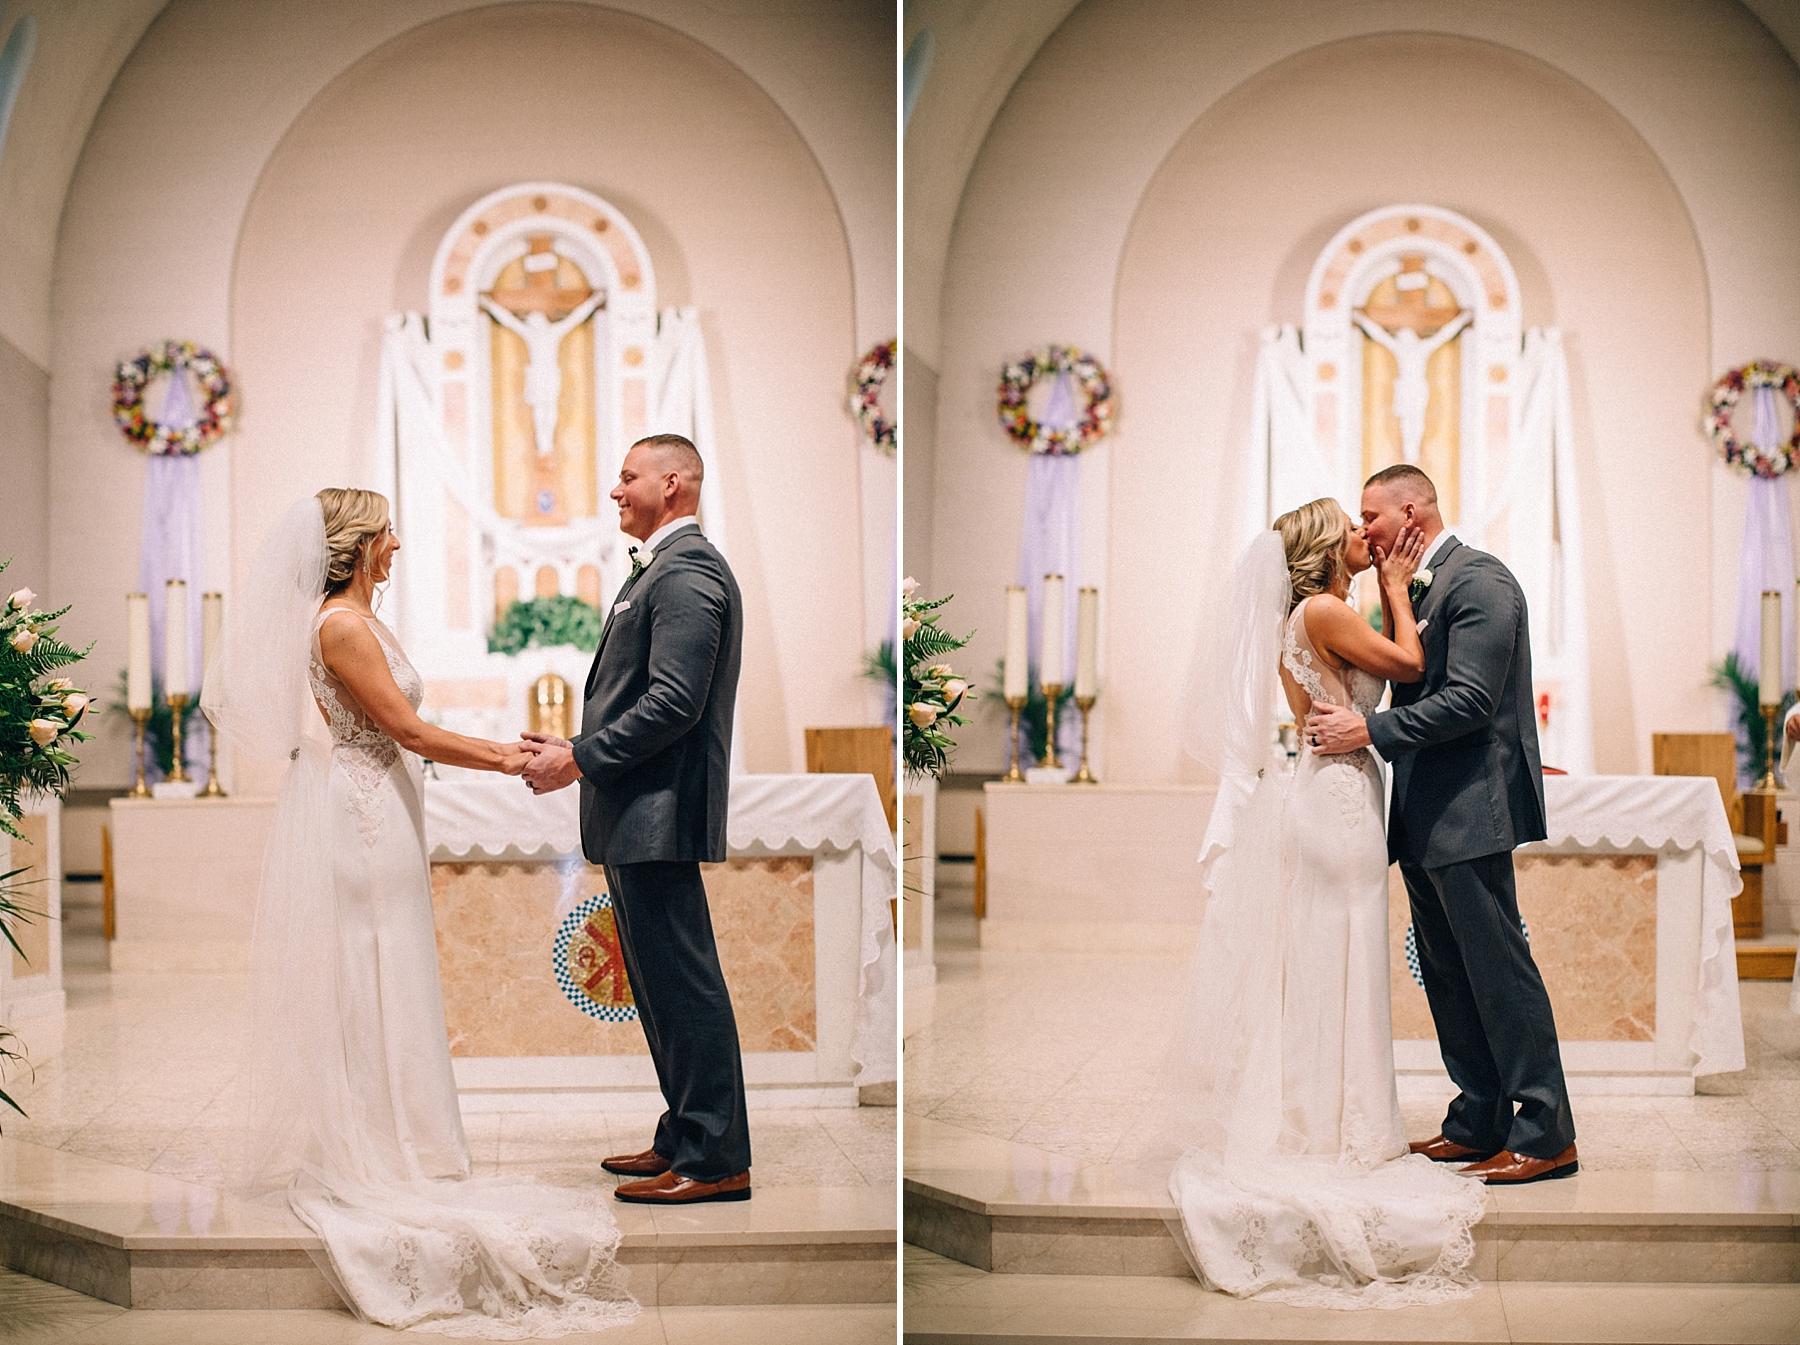 cranford-washington-nj-wedding-photographer-seasons_0038.jpg